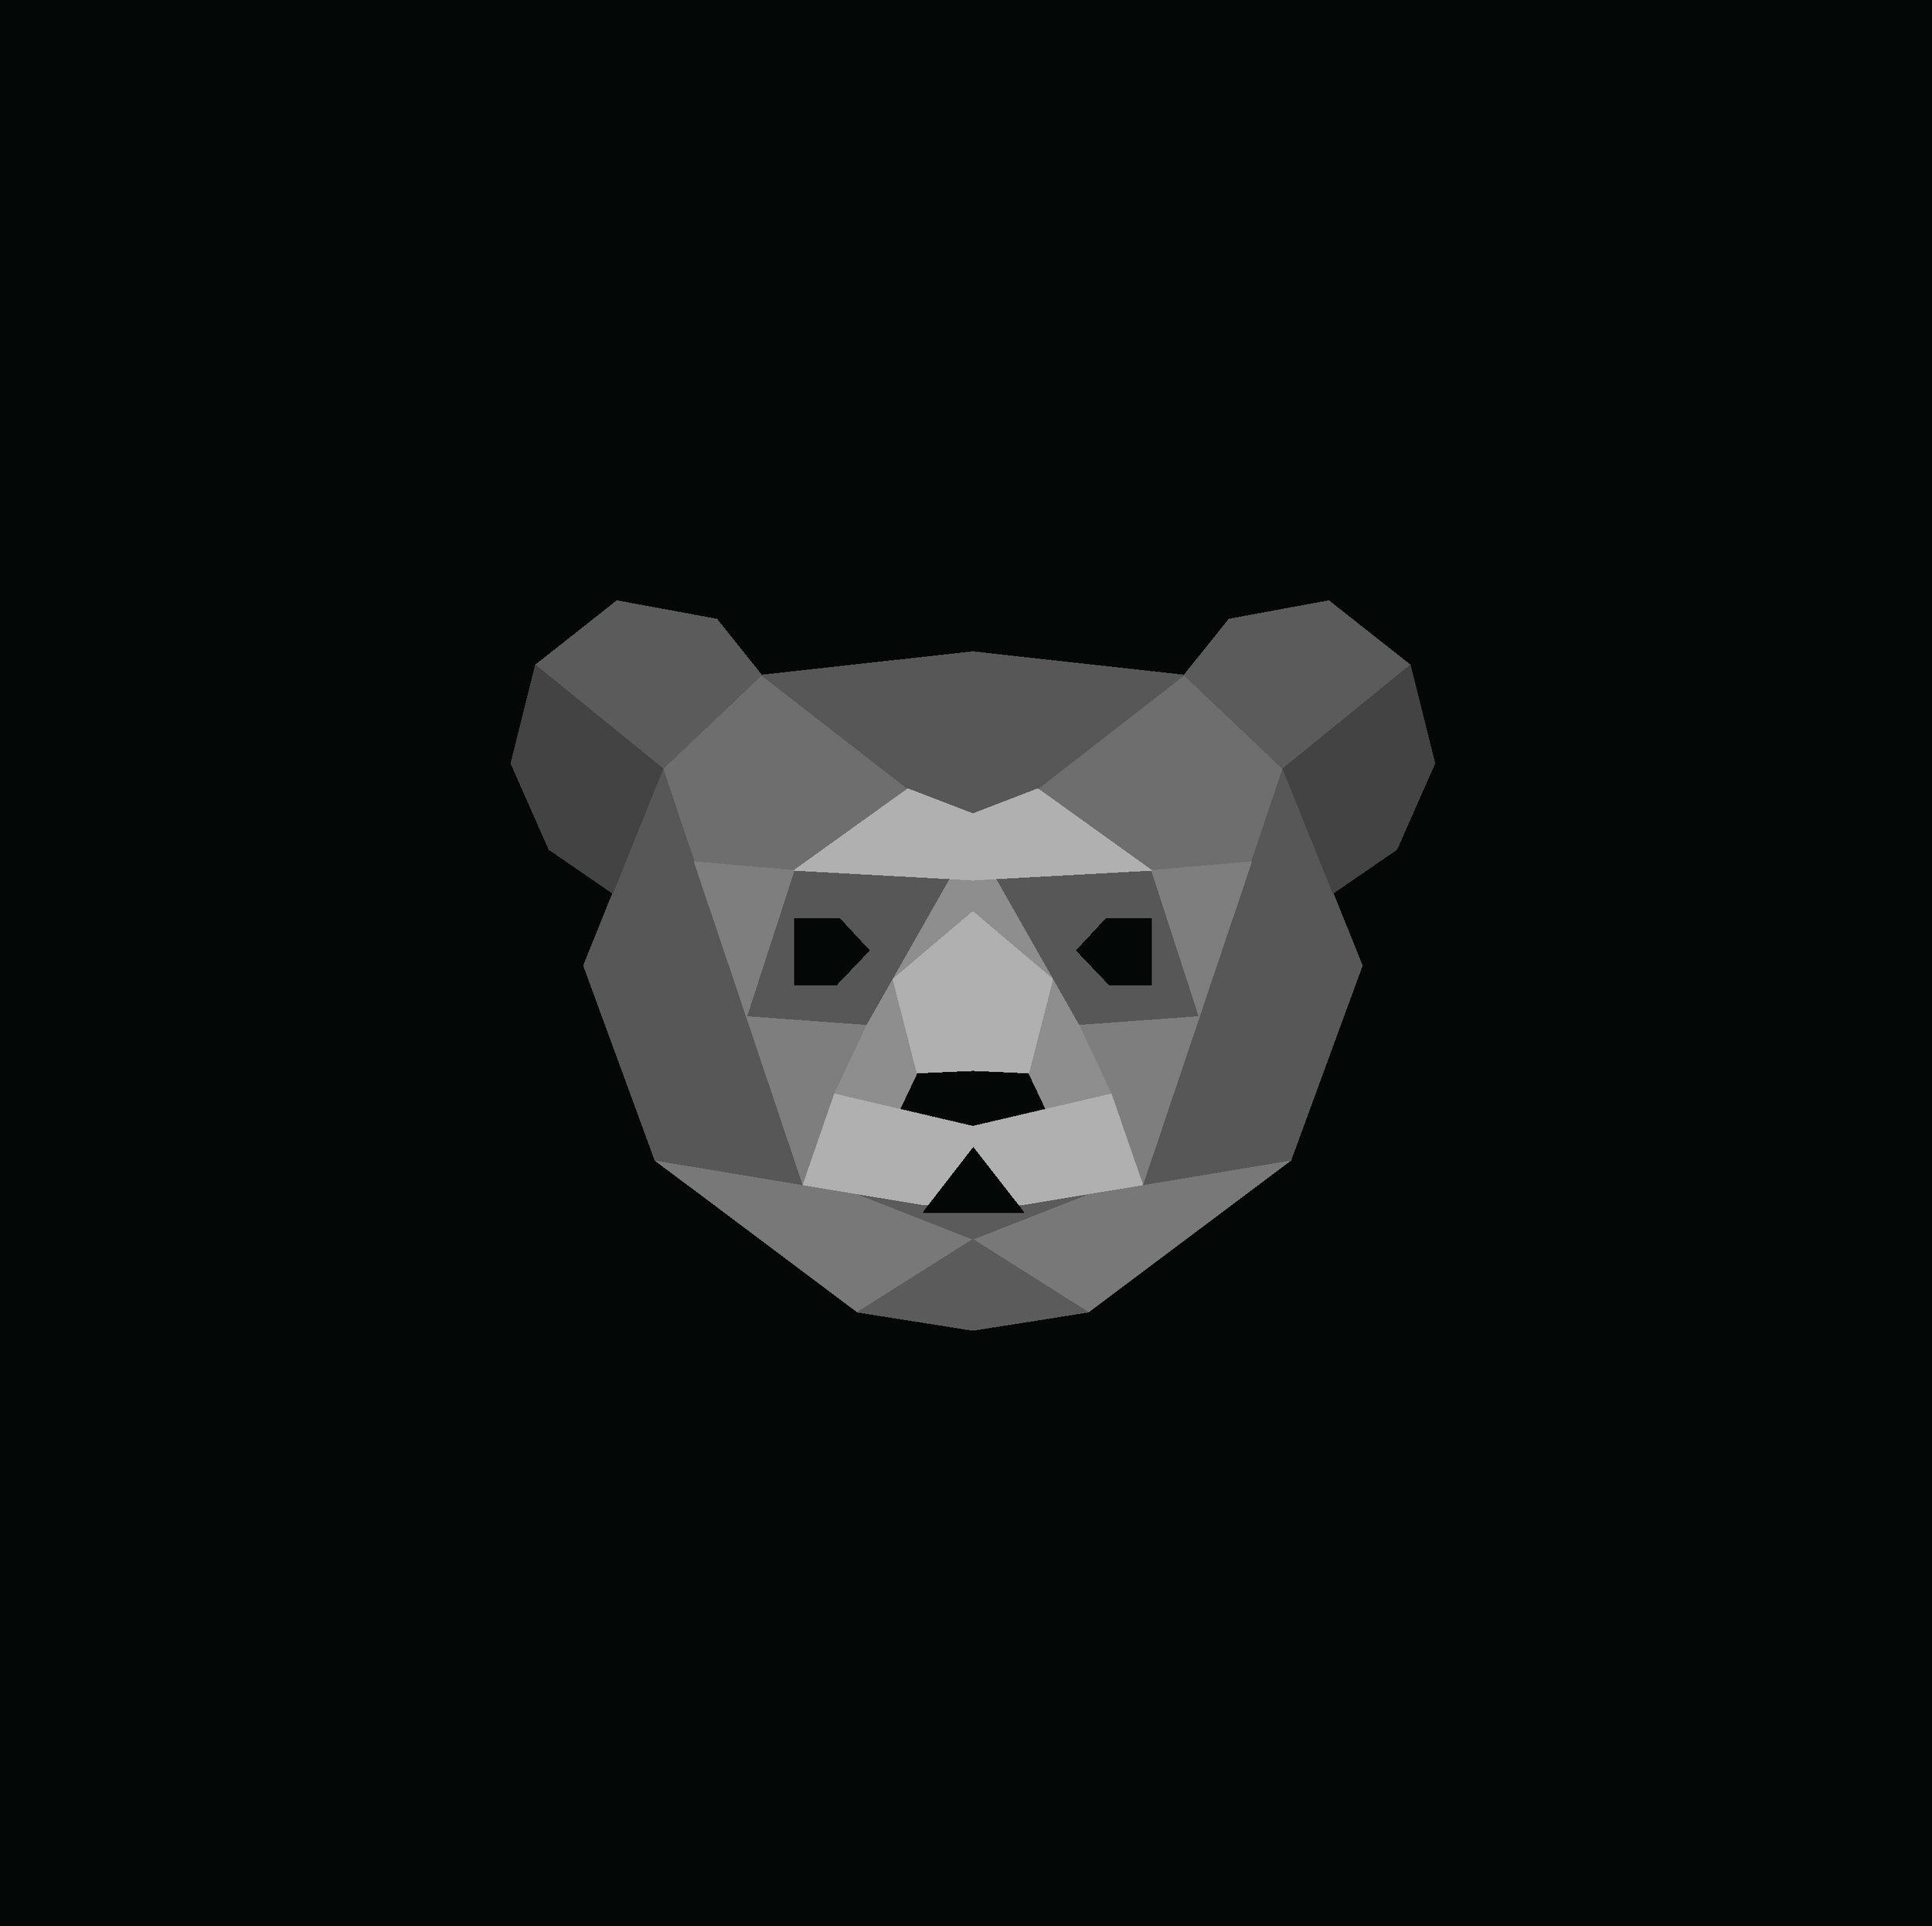 ConversionCub_logo.jpg